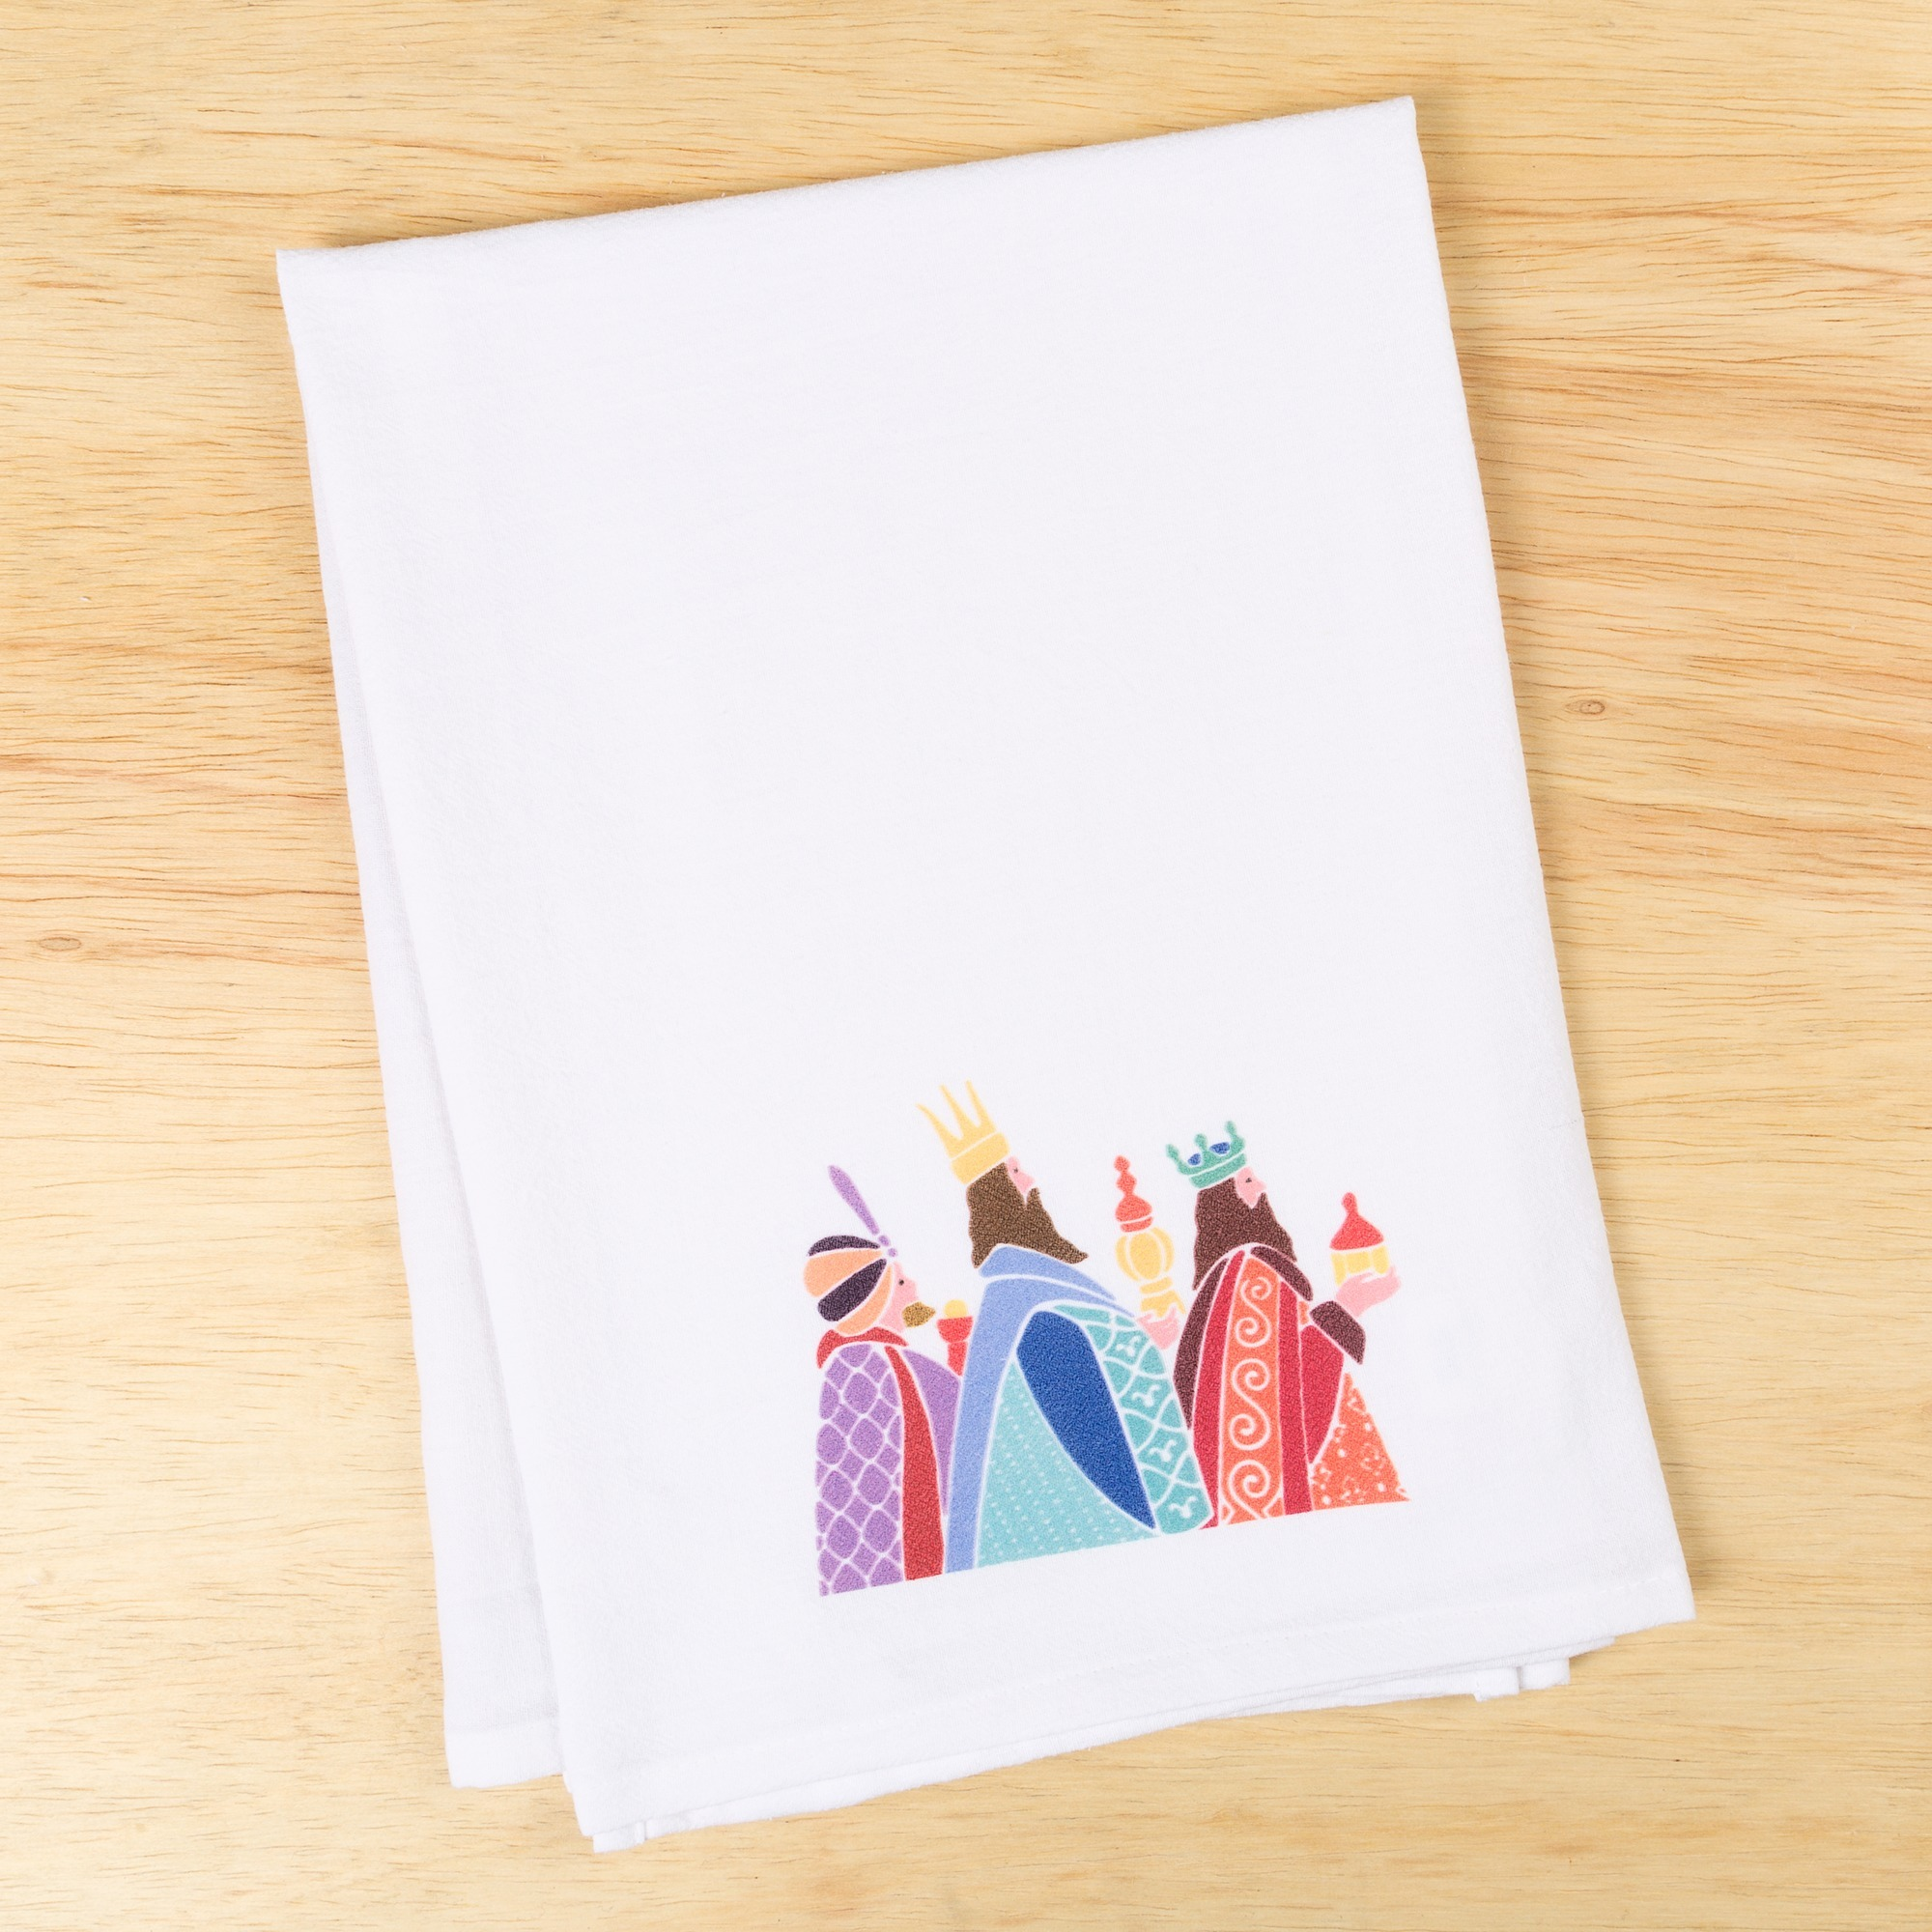 3 Kings Flour Sack Dish Towel The Catholic Company